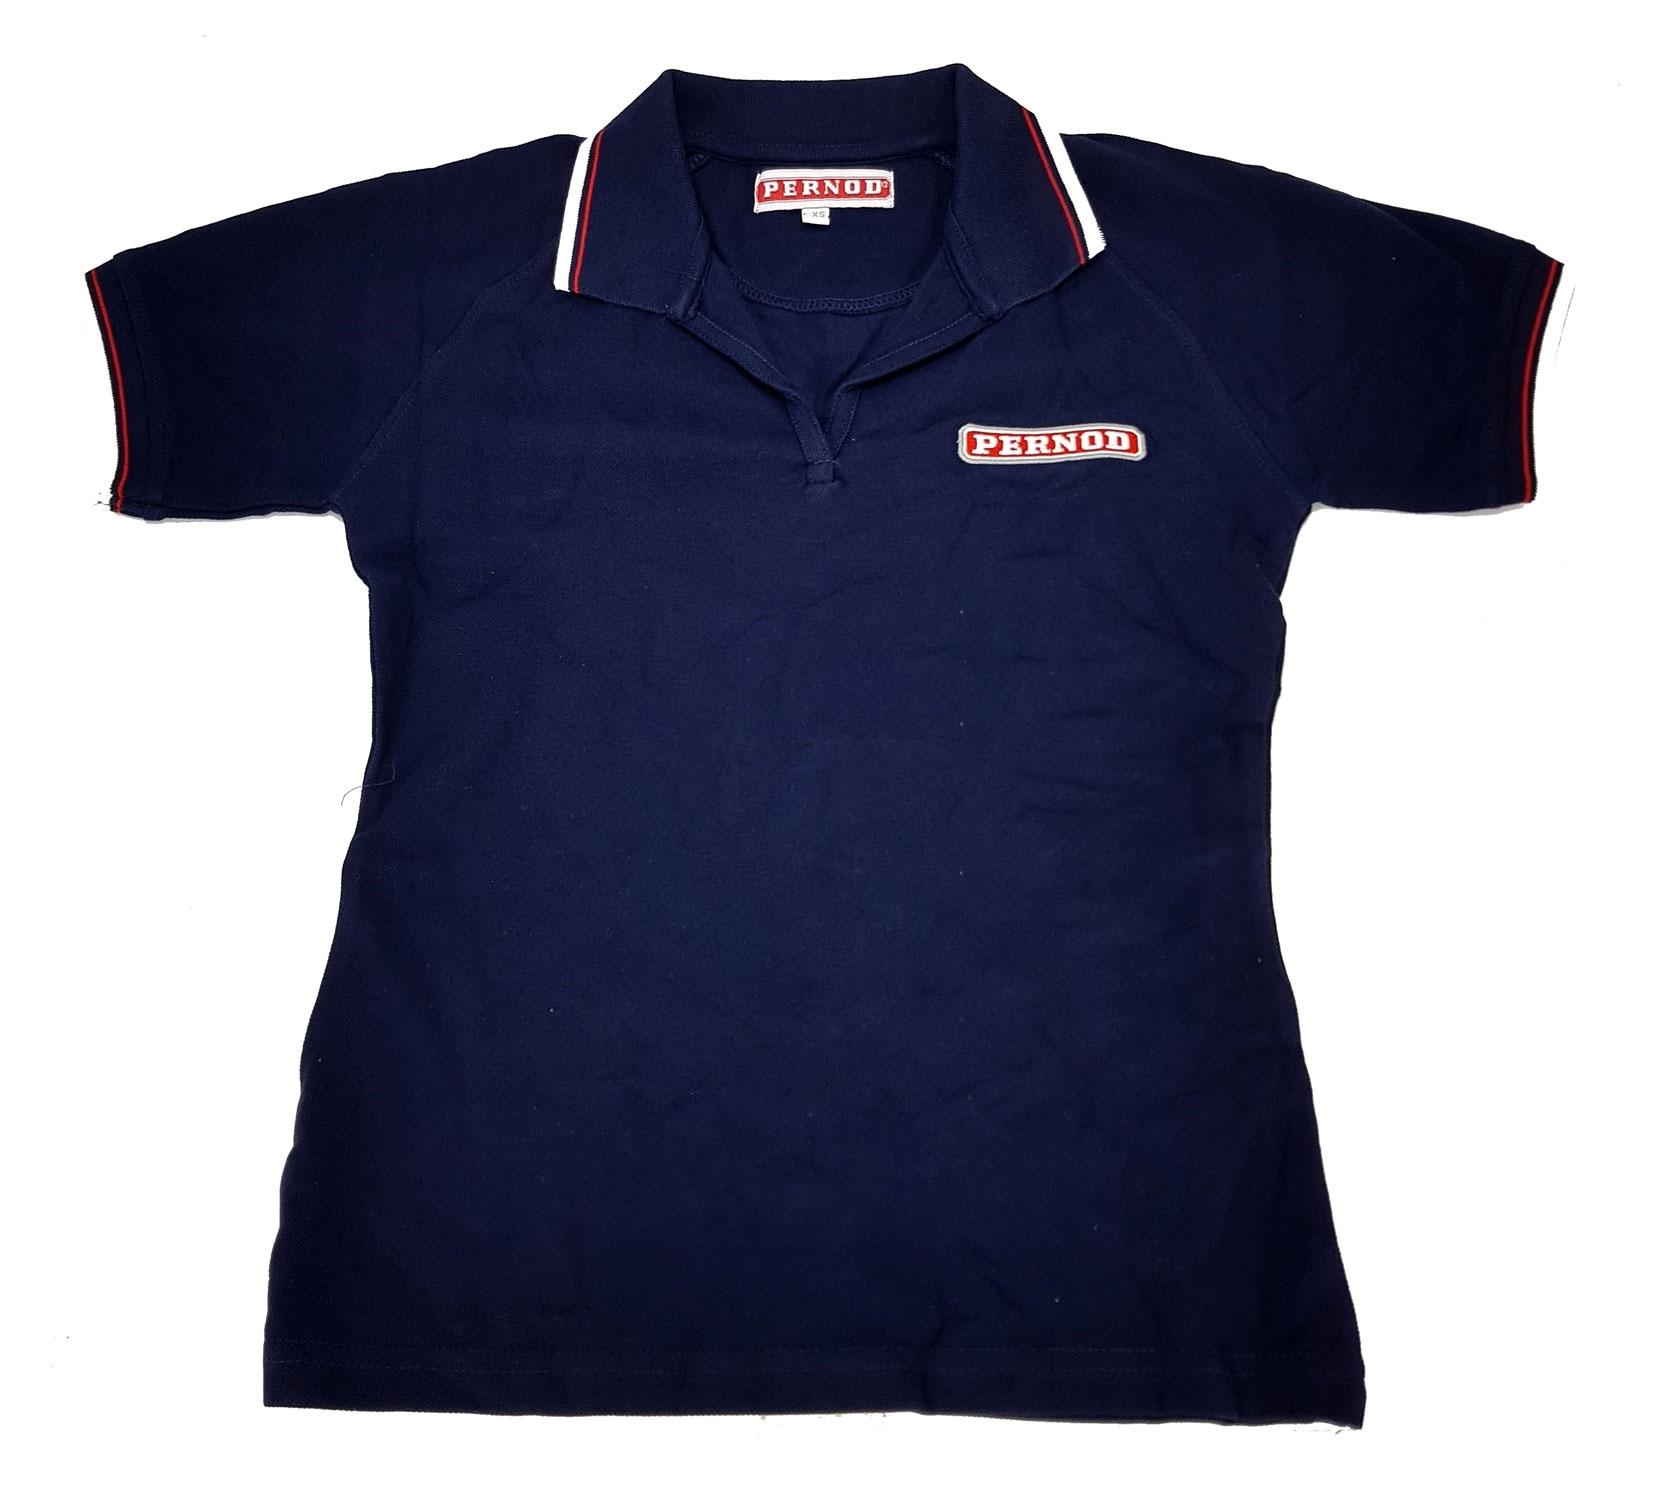 Pernod Poloshirt Polo Shirt Hemd T-Shirt 100% Baumwolle - Blau Größe X/S